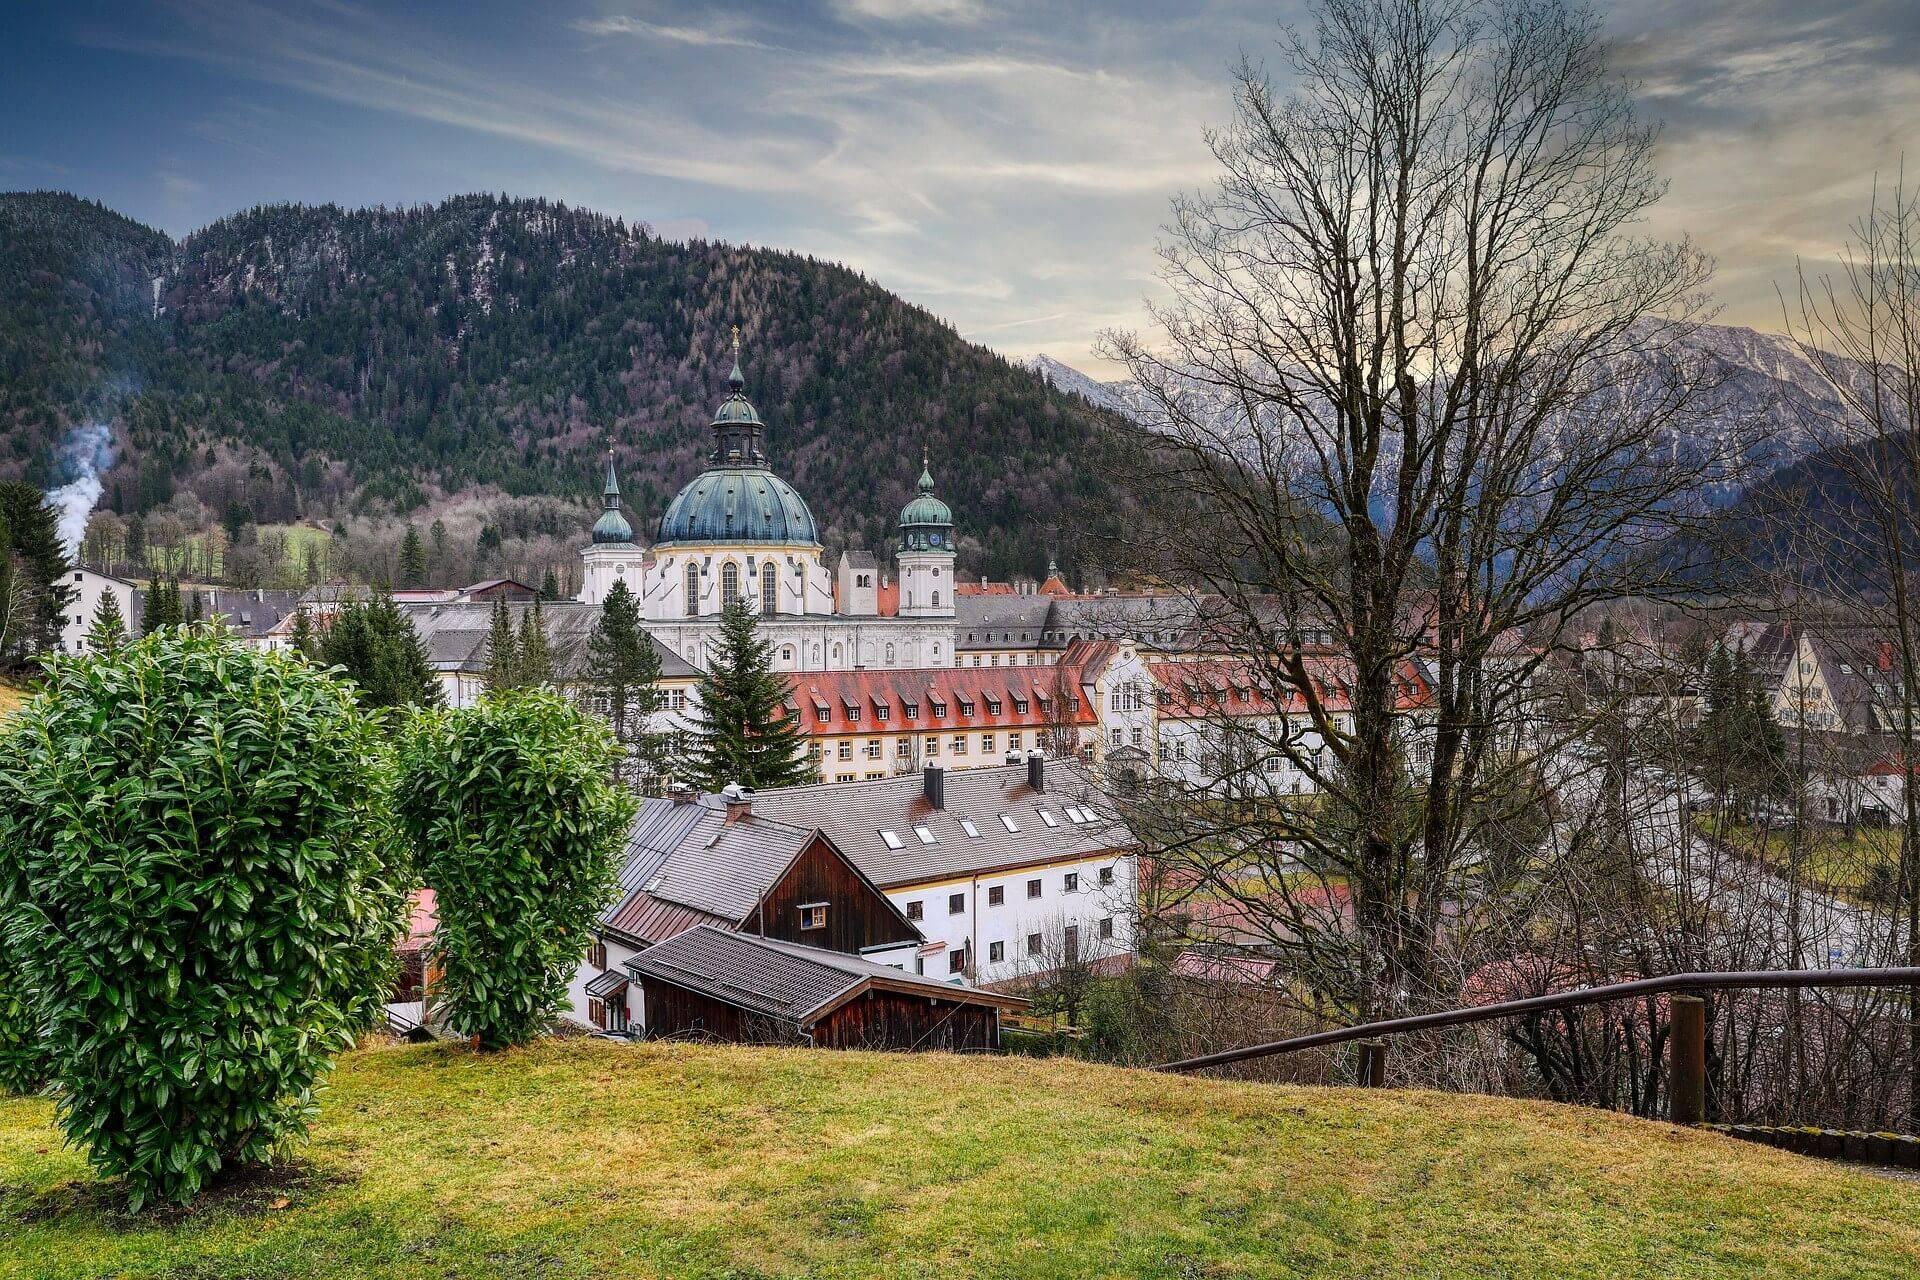 Монастырь этталь: архитектура и интерьер церкви при монастыре